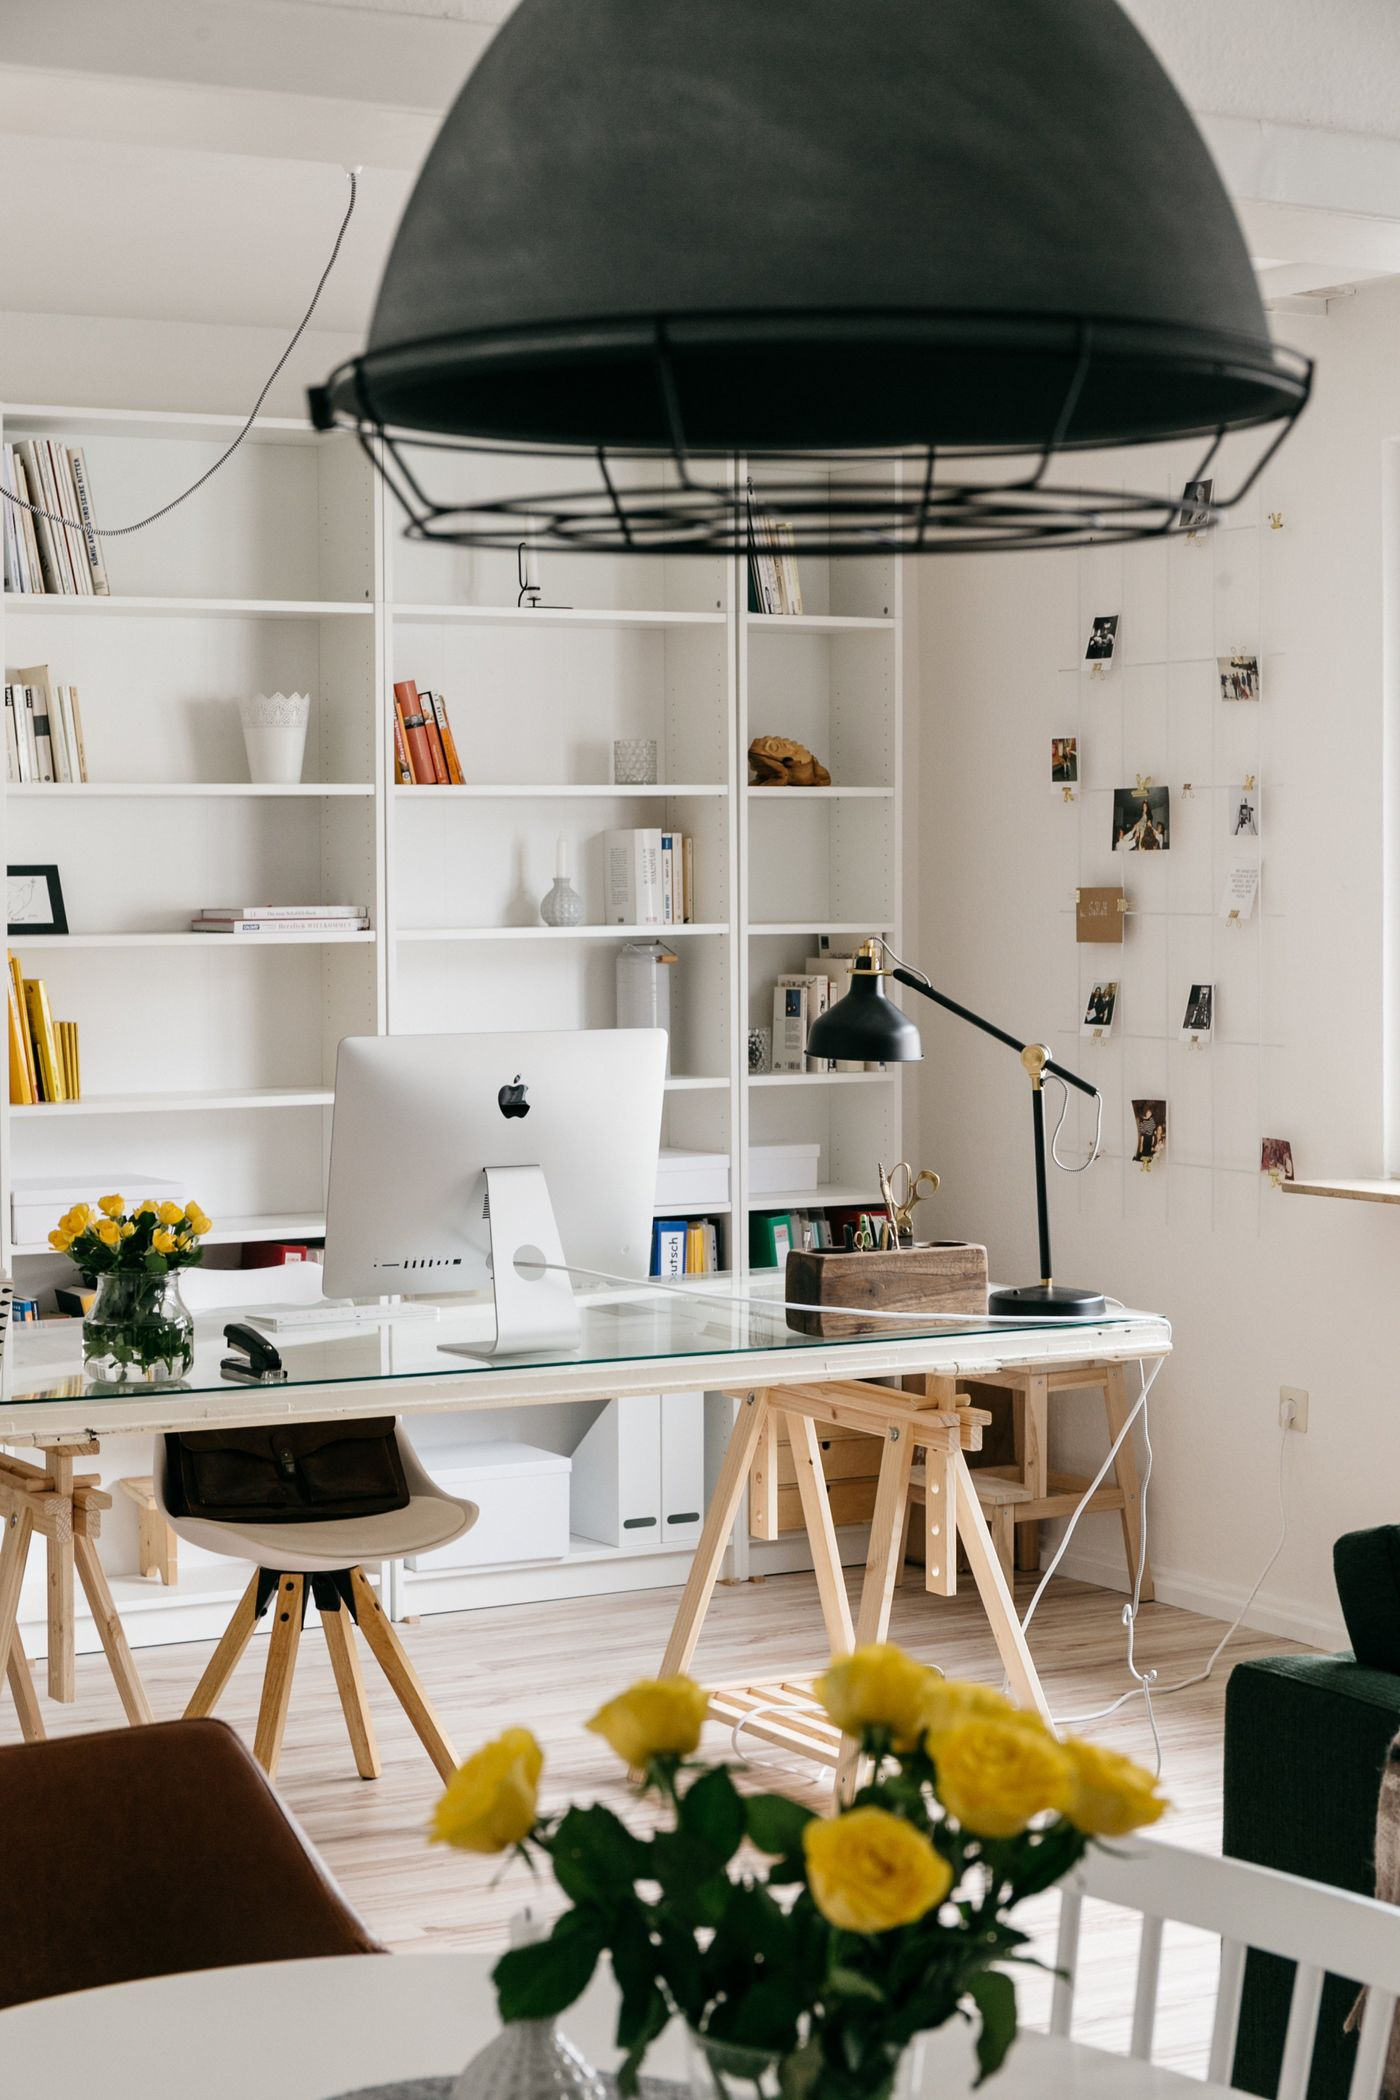 5 Kreative Upcycling Diy Ideen Fur Tische Solebich De